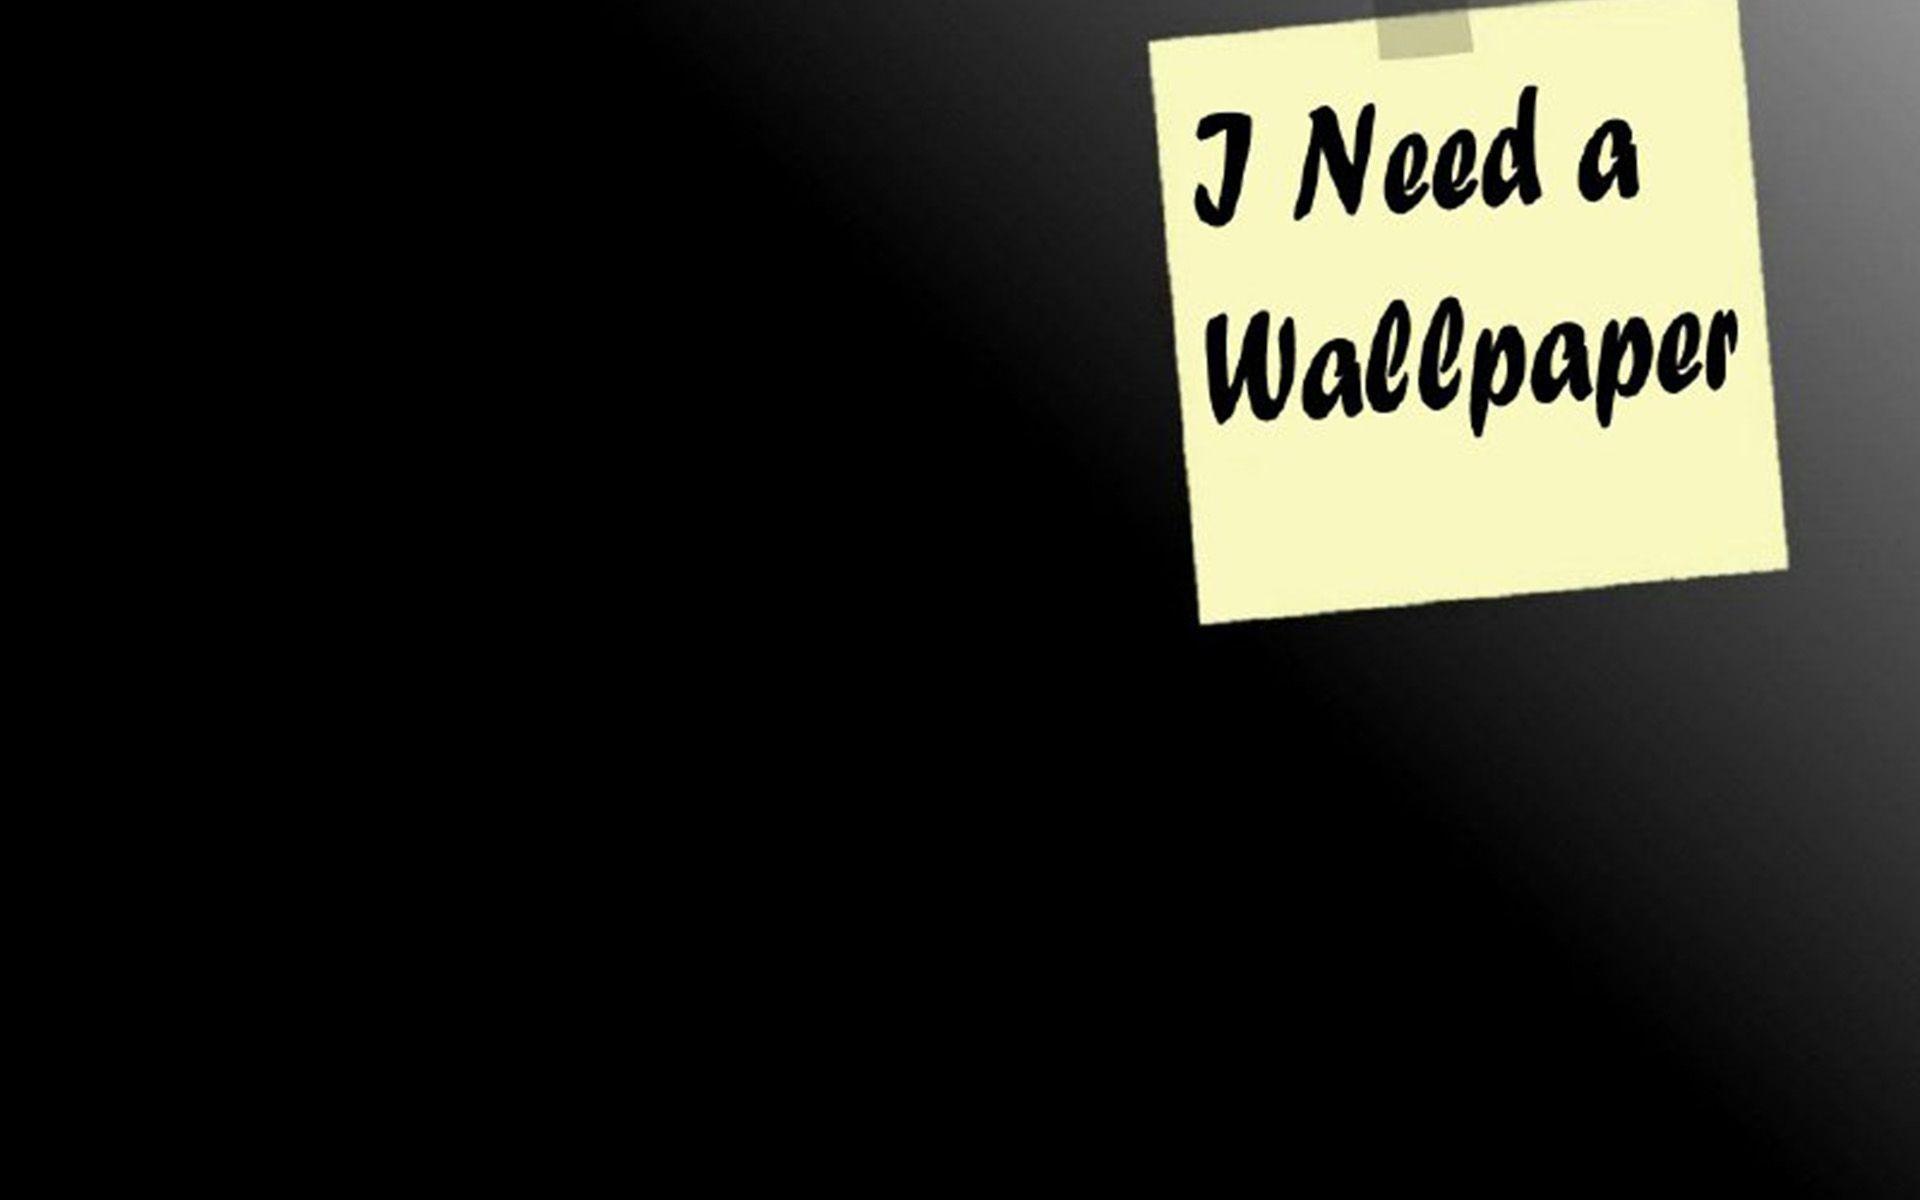 66 Funny Desktop Wallpapers on WallpaperPlay 1920x1200